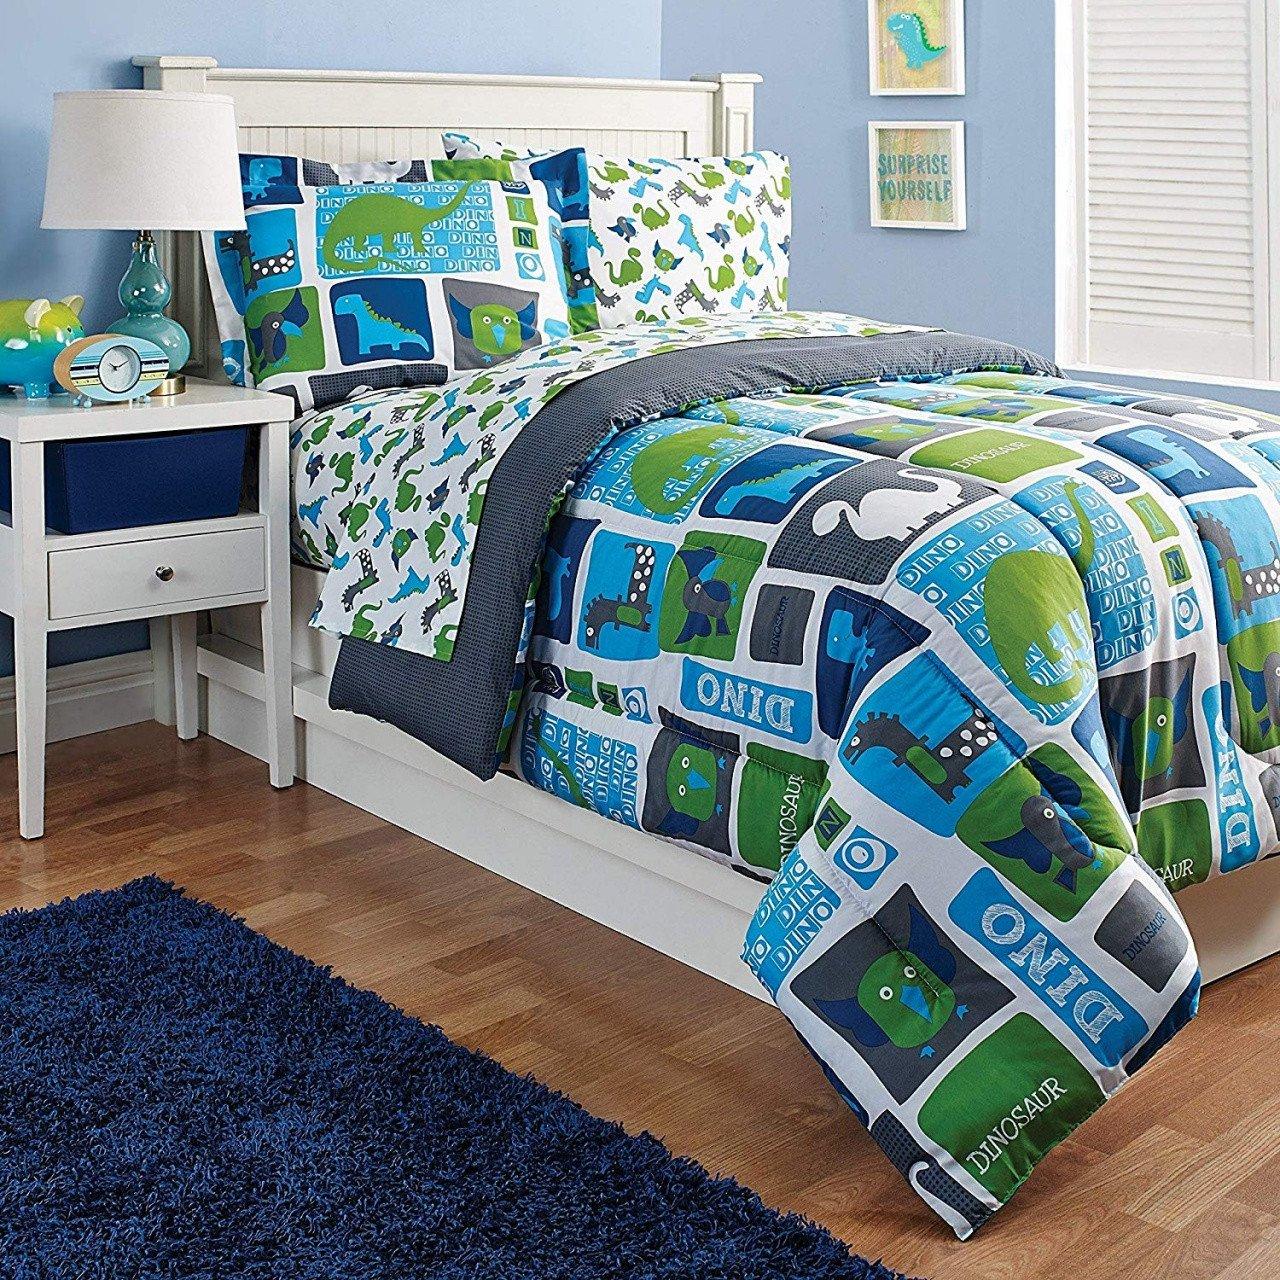 Cheap Twin Bedroom Set Lovely Kids Bedroom Sets Under 500